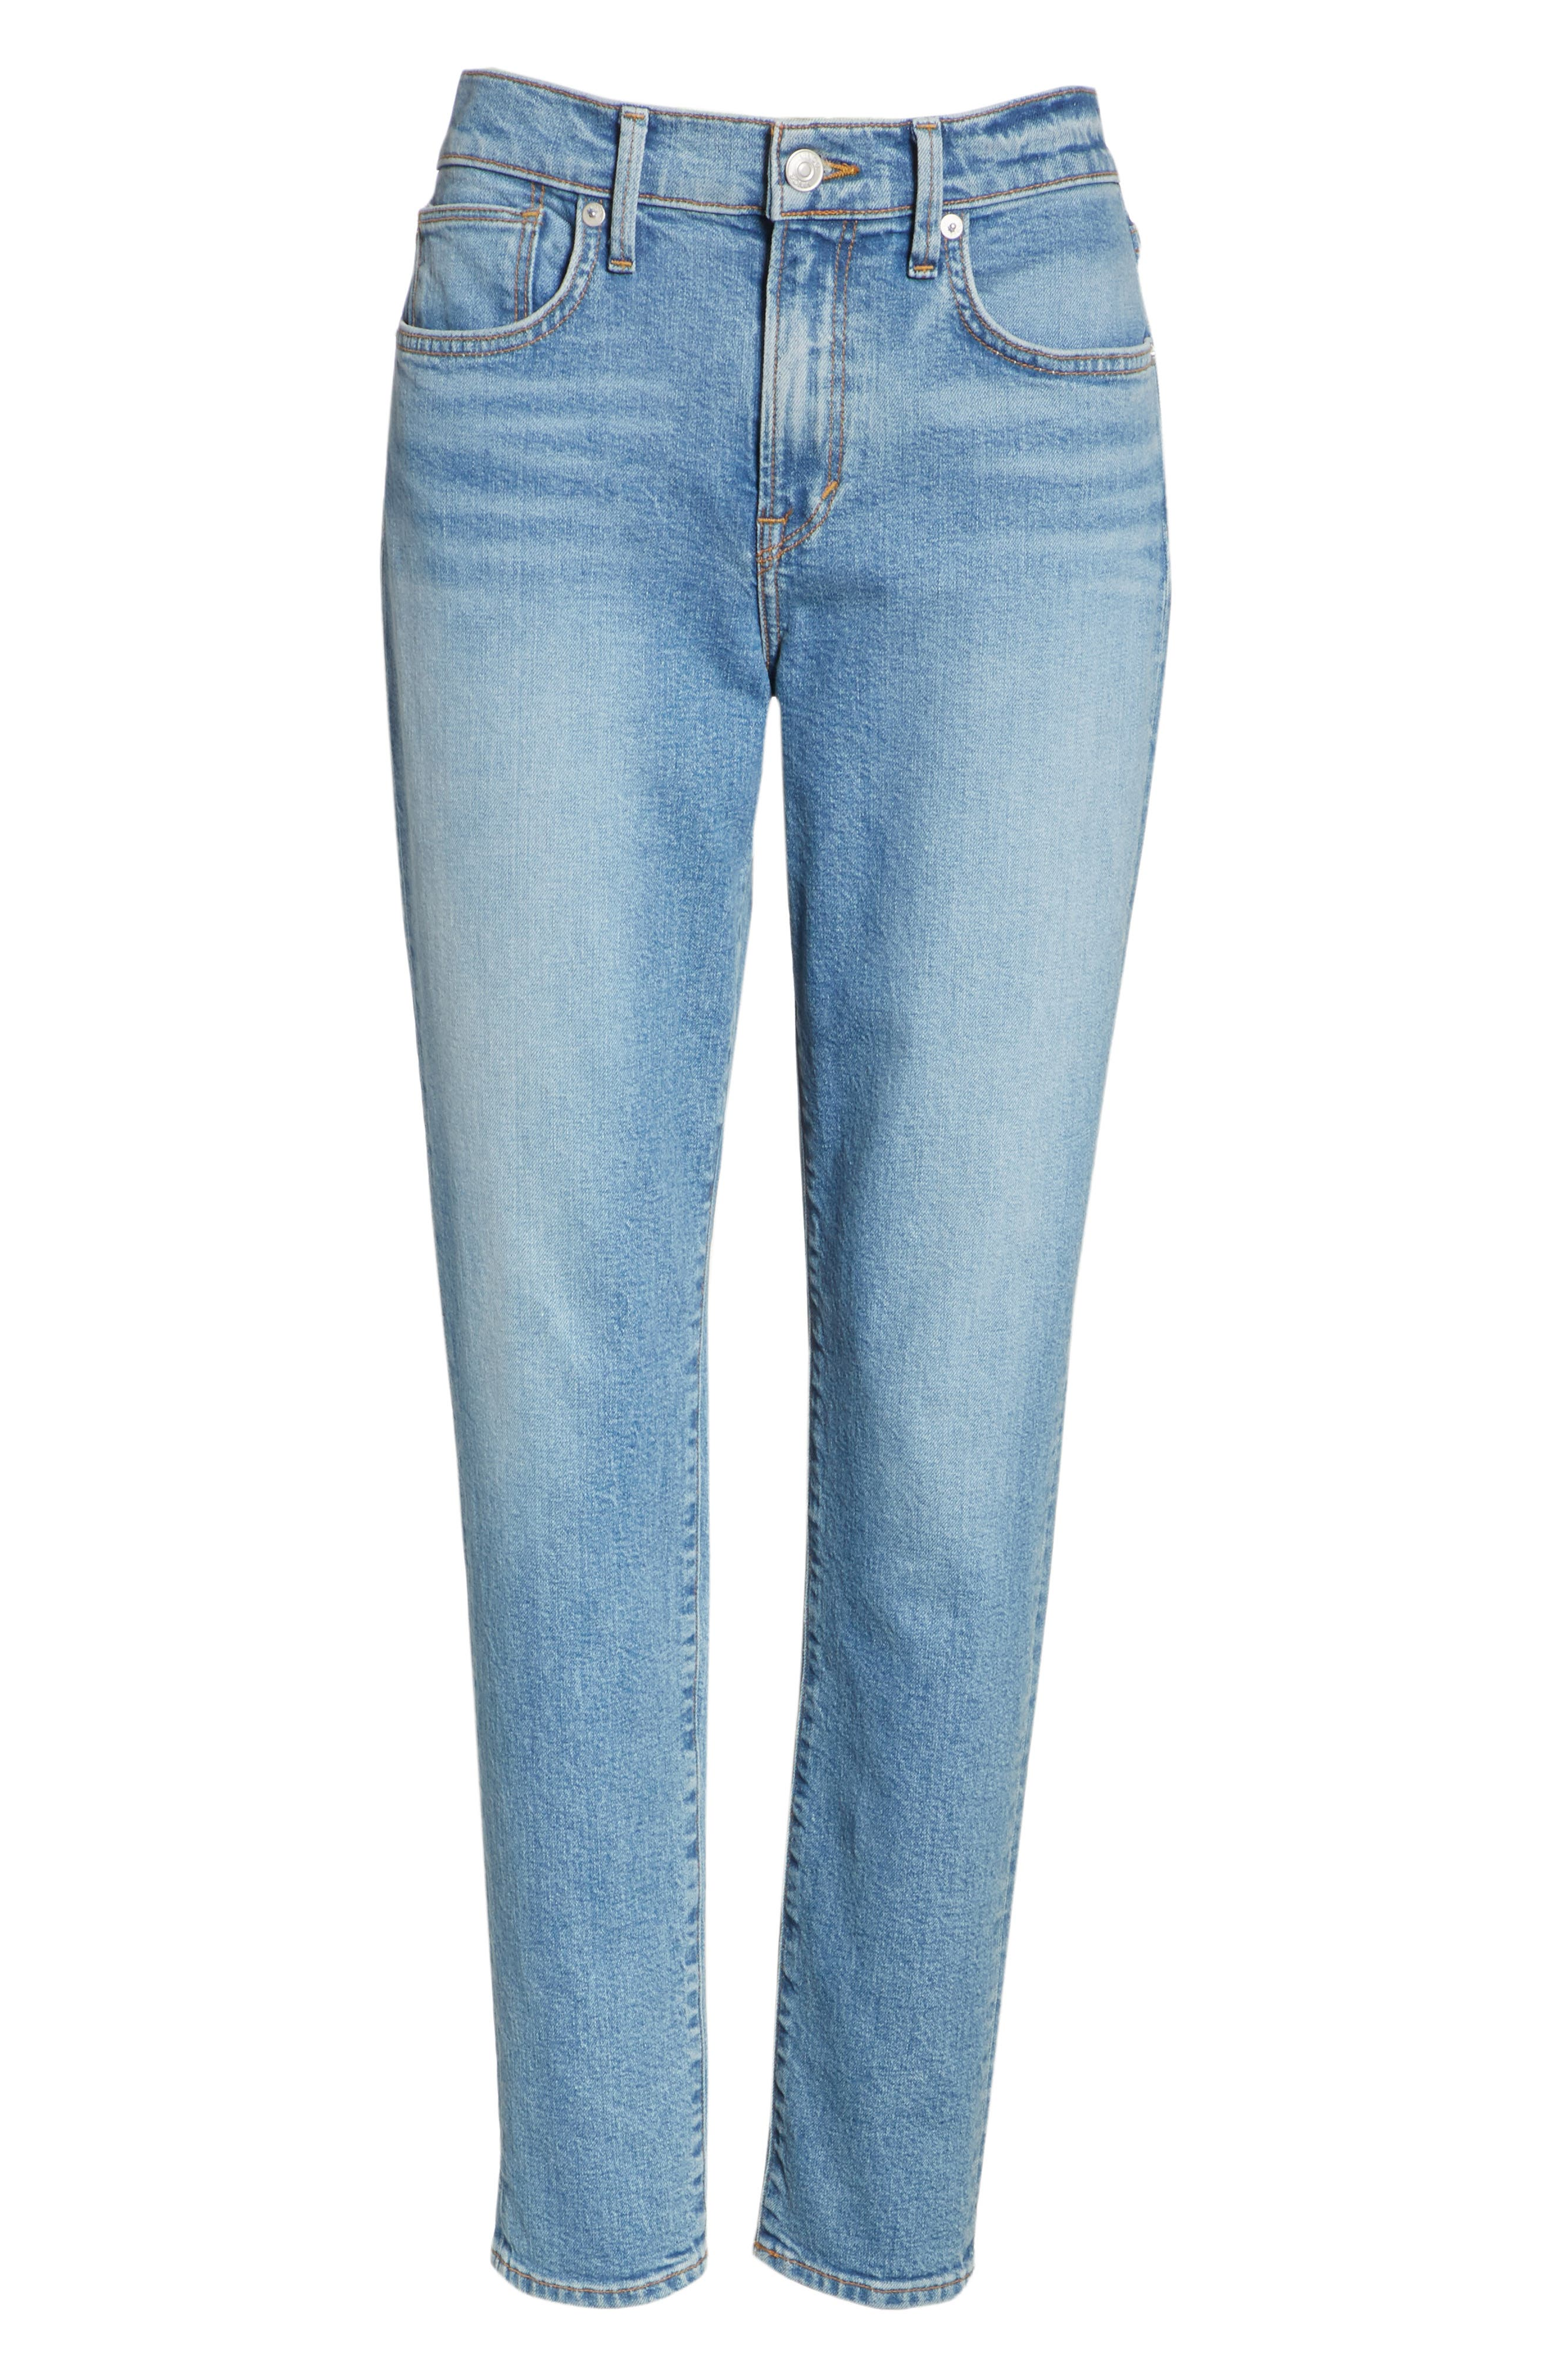 5-Pocket Skinny Jeans,                             Alternate thumbnail 6, color,                             LIGHT WASH